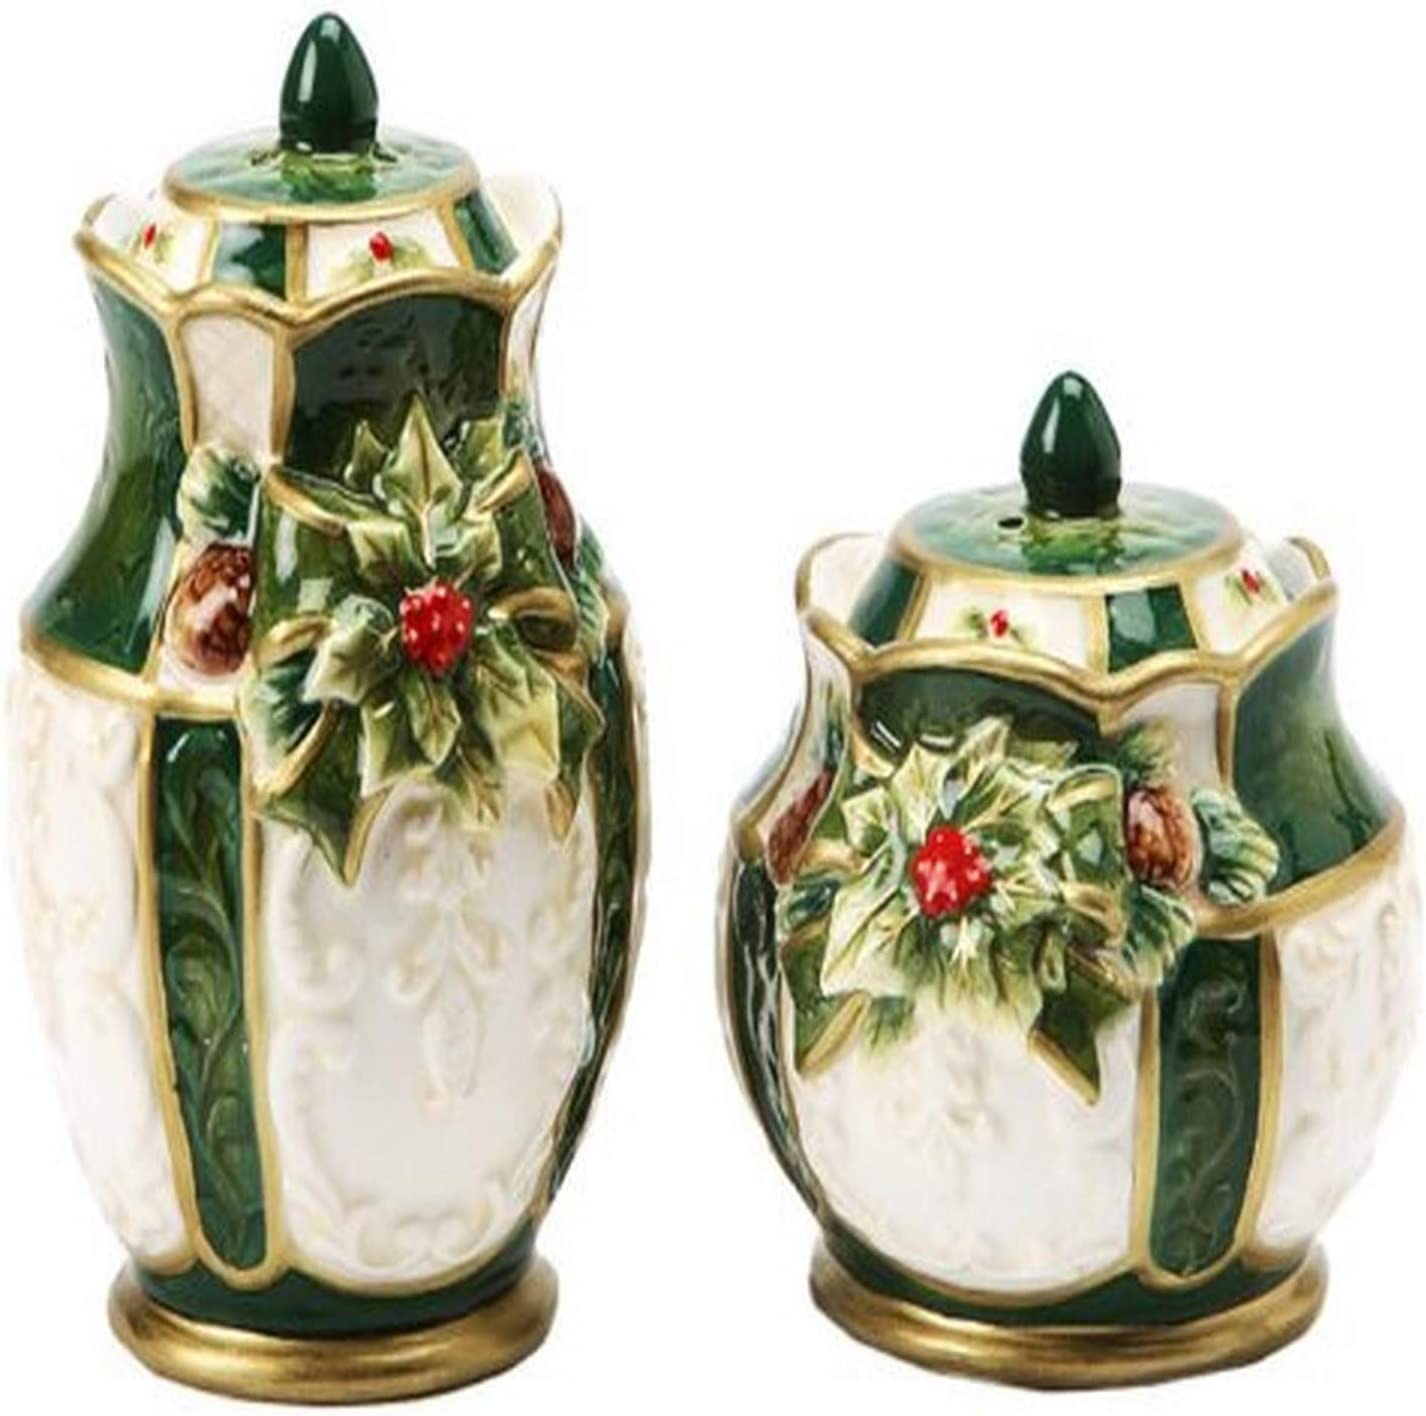 Cosmos Emerald Holiday Holly Salt /& Pepper Set